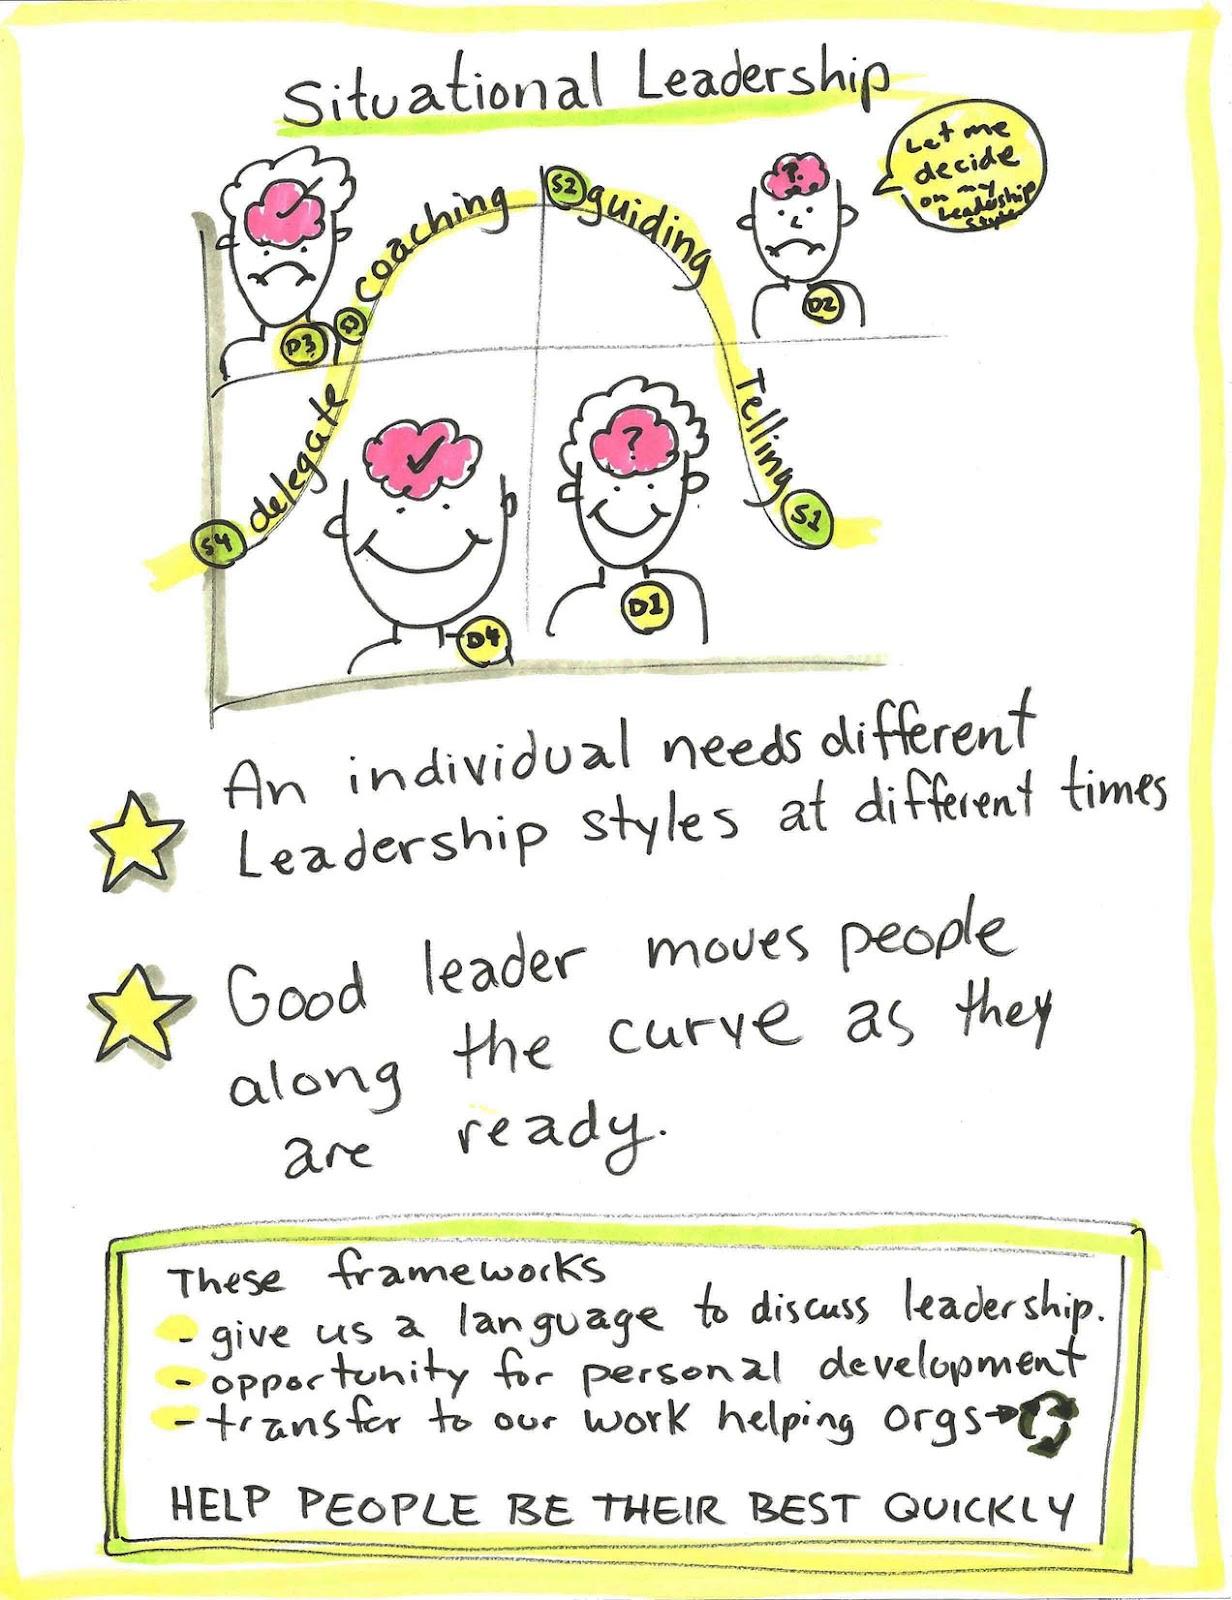 situational leadership | aha! graphic facilitation